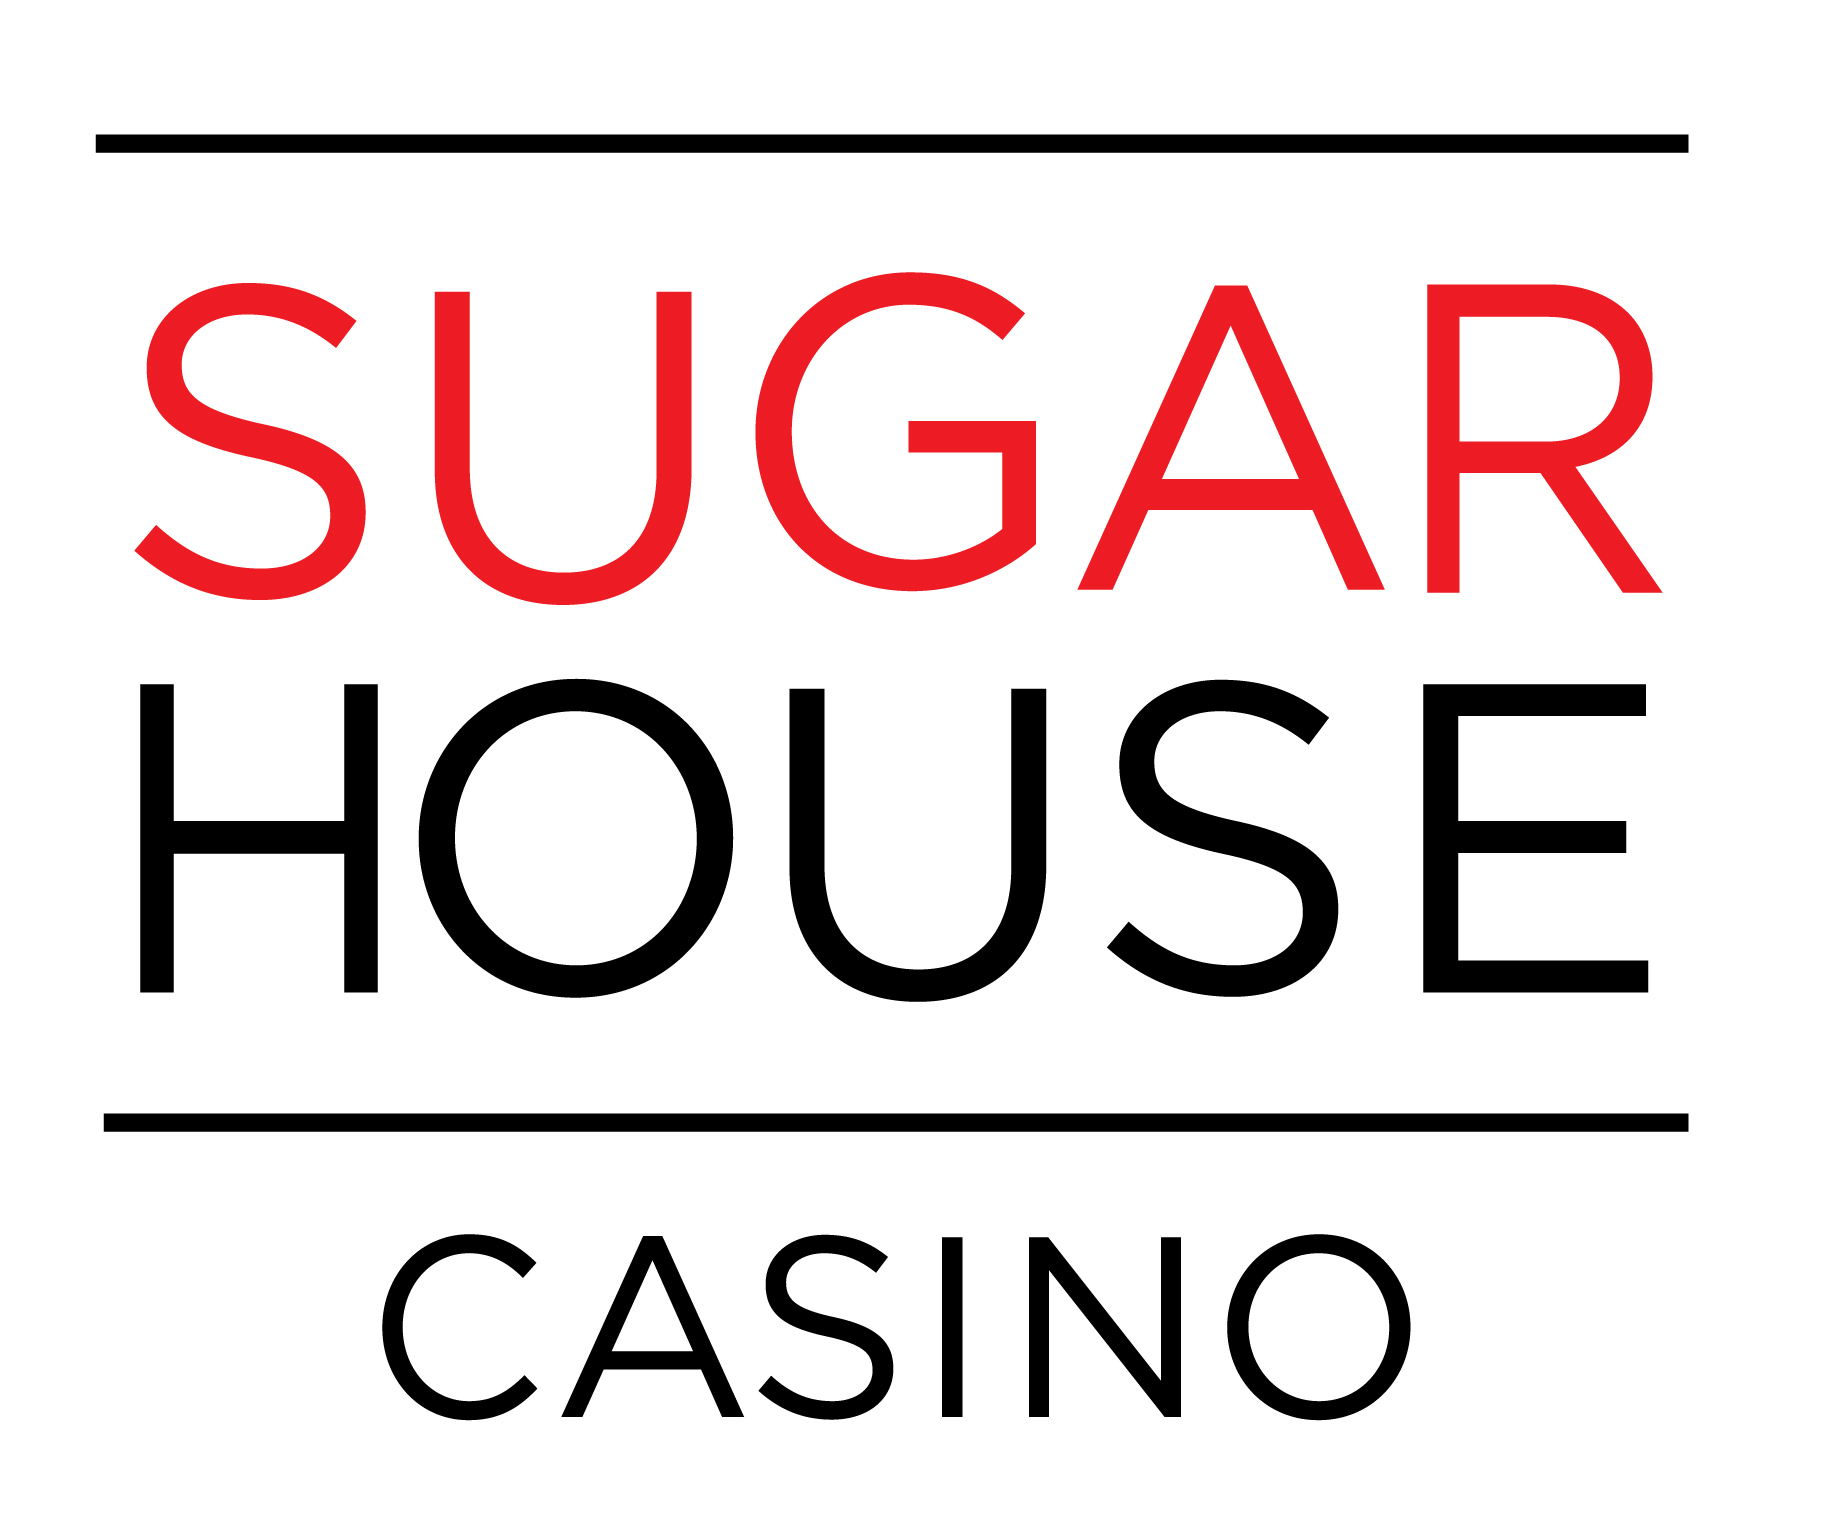 Sugarhouse casino online casino the best online casino